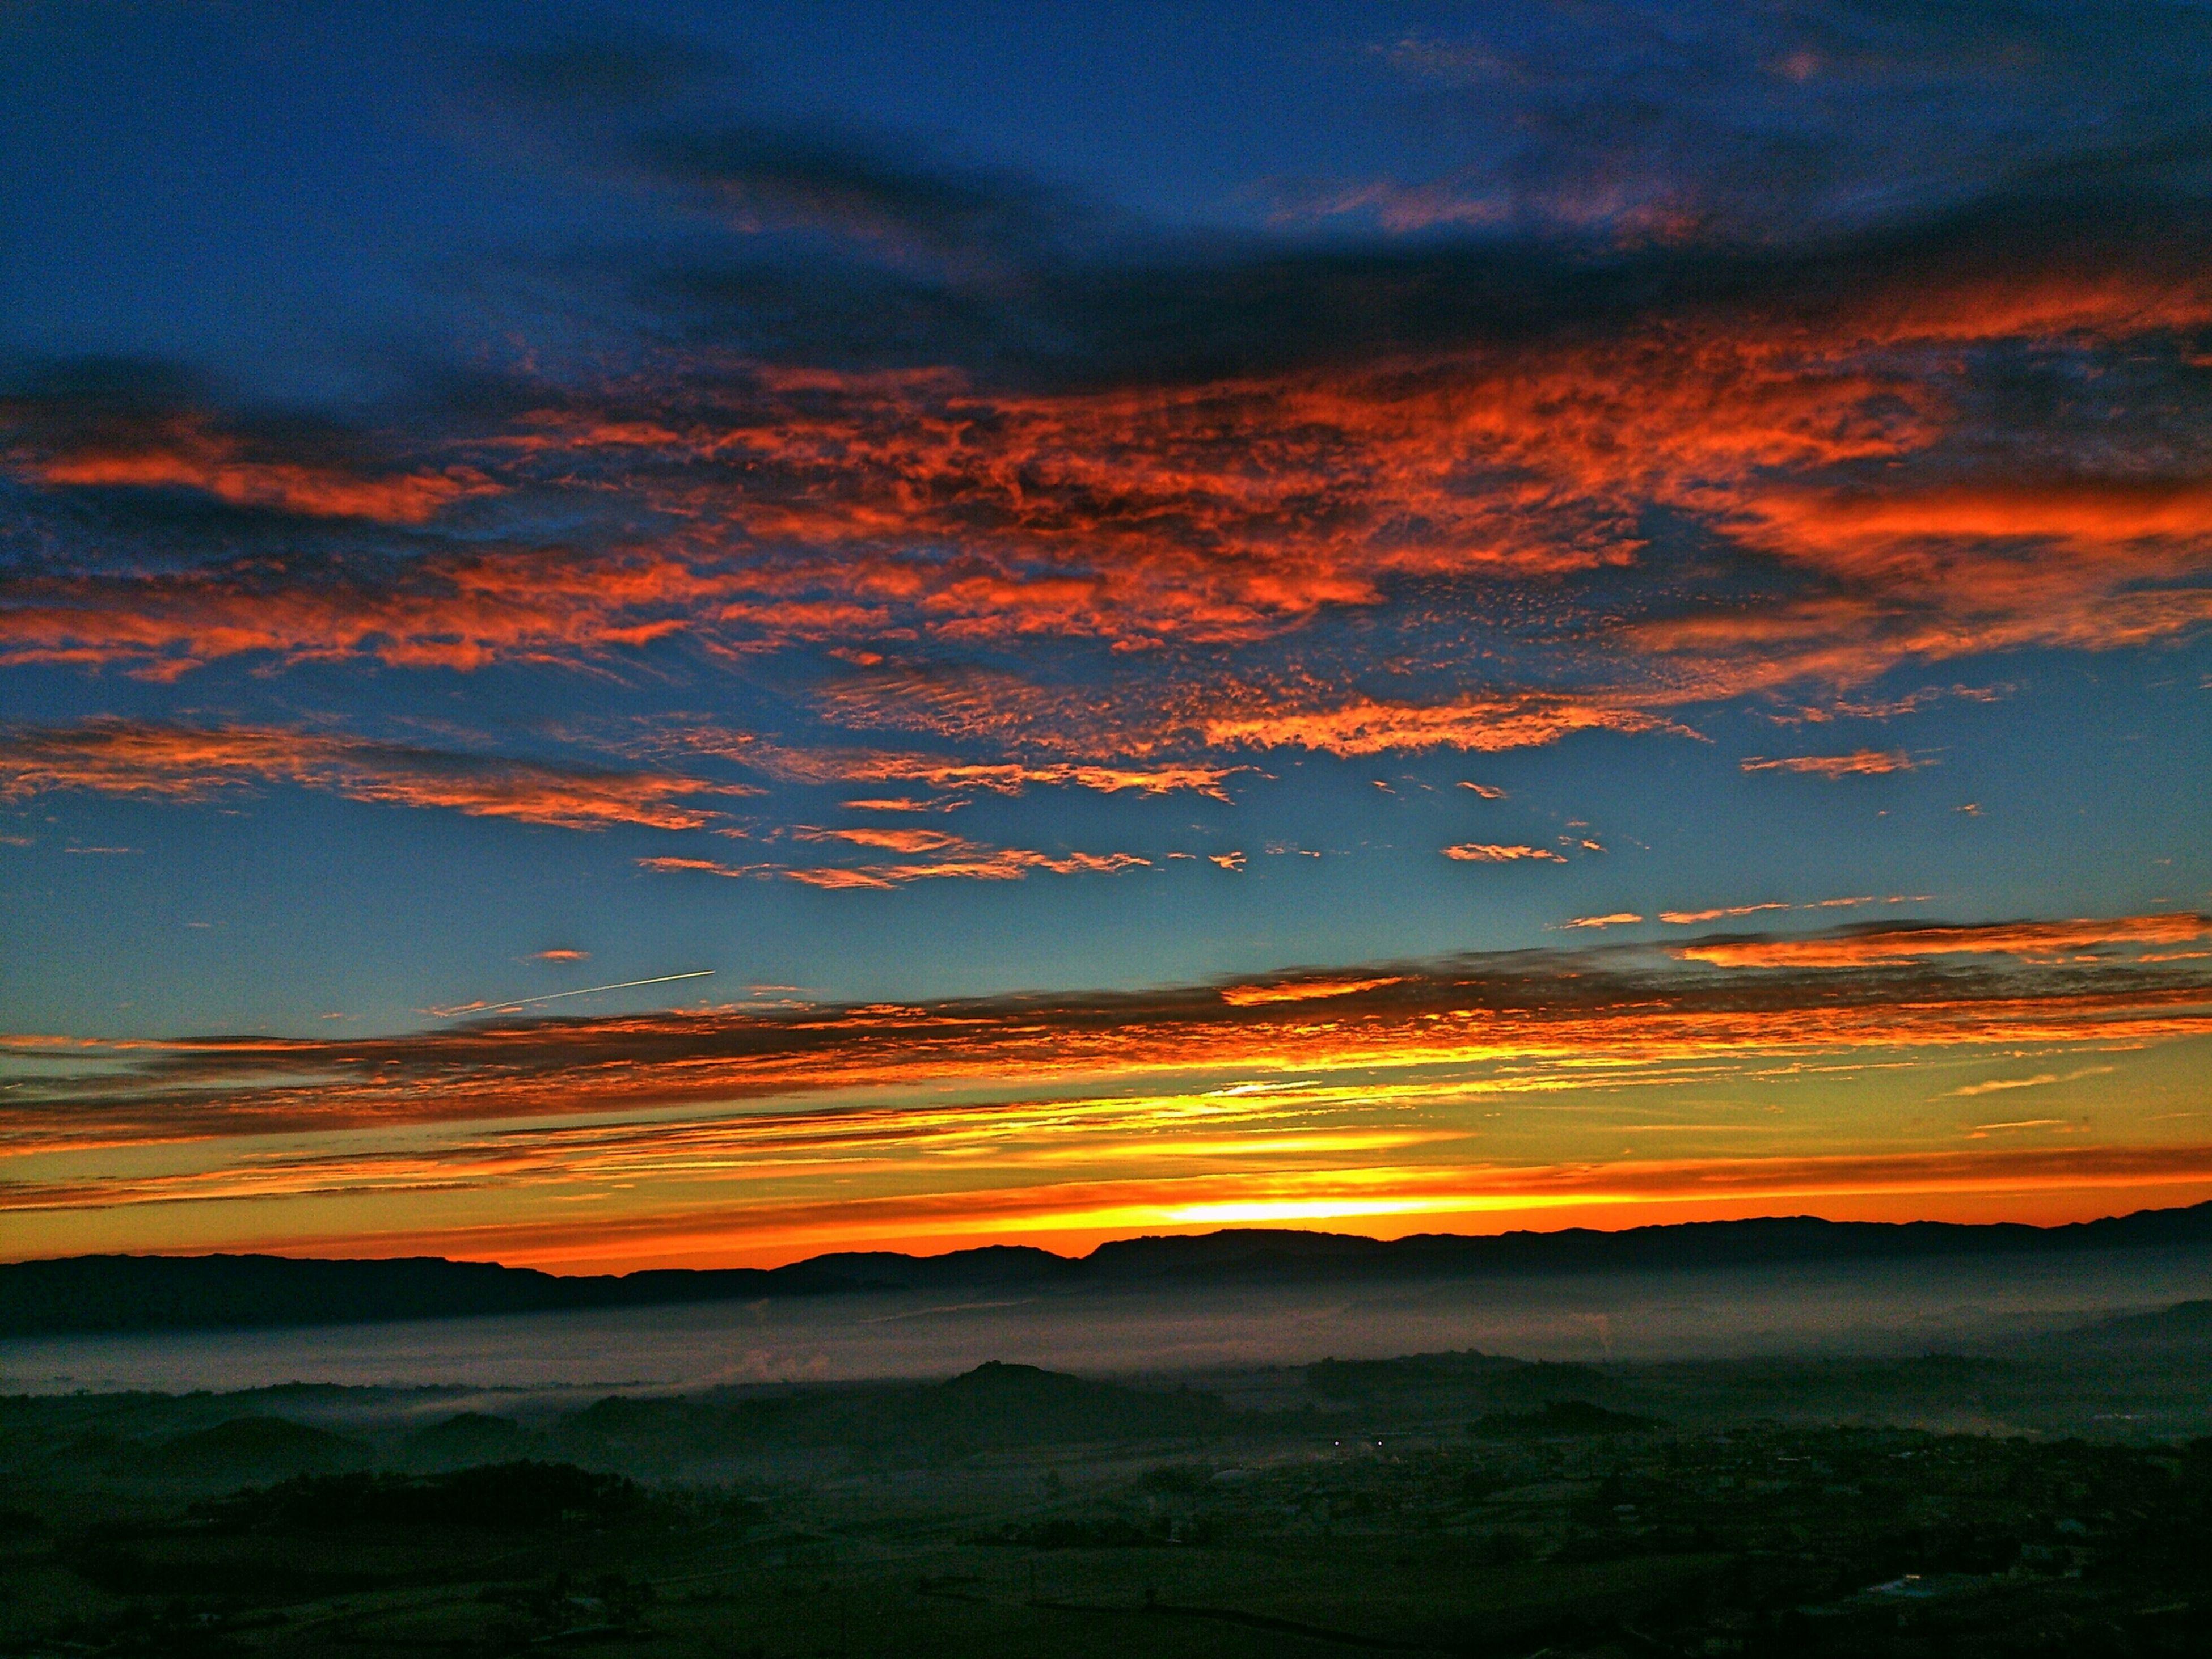 sunset, scenics, orange color, tranquil scene, tranquility, beauty in nature, sky, idyllic, dramatic sky, nature, landscape, cloud - sky, silhouette, majestic, cloud, mountain, non-urban scene, water, dusk, moody sky